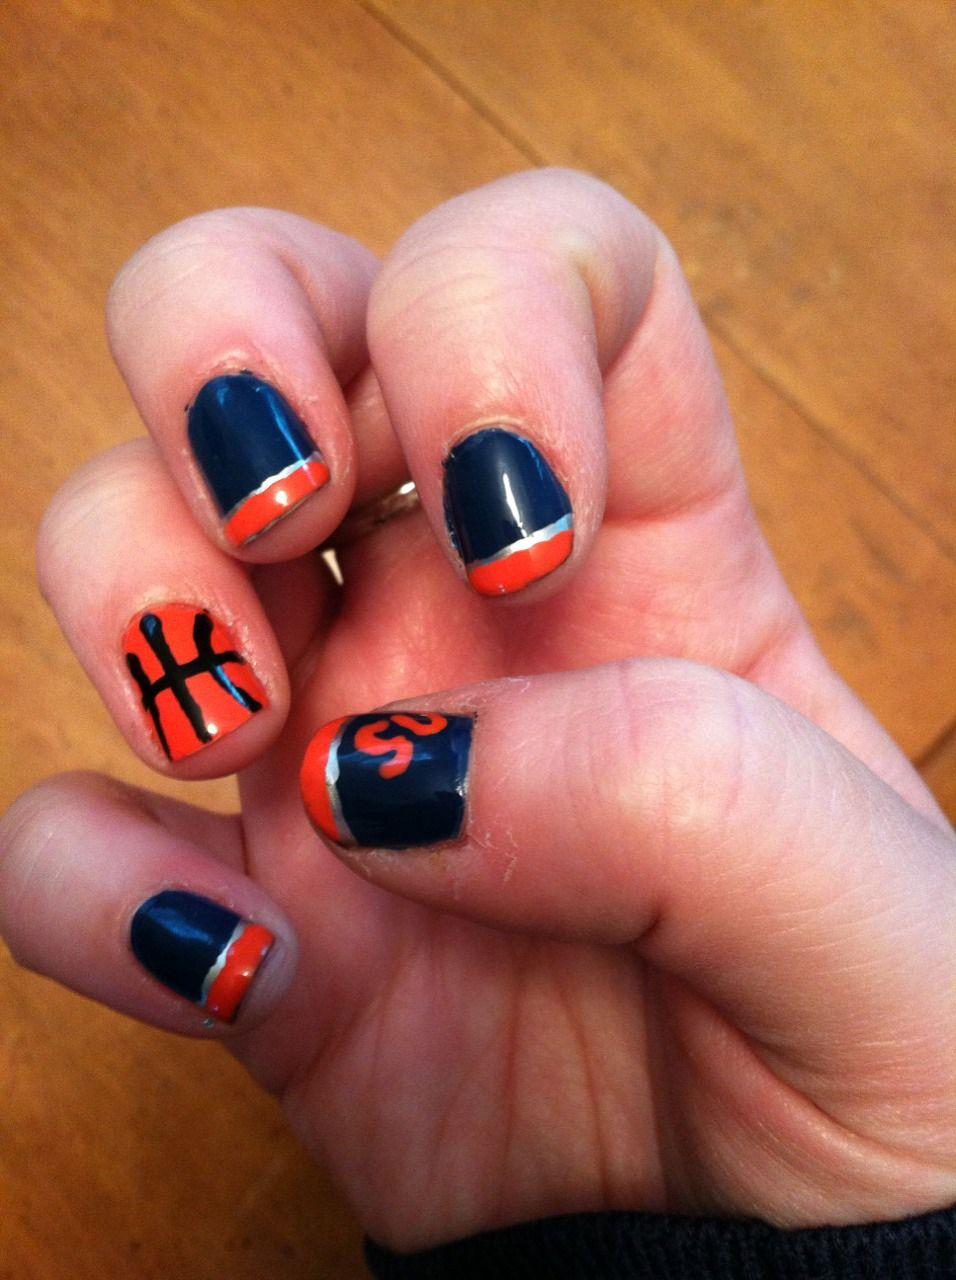 nail polish & wine - basketball